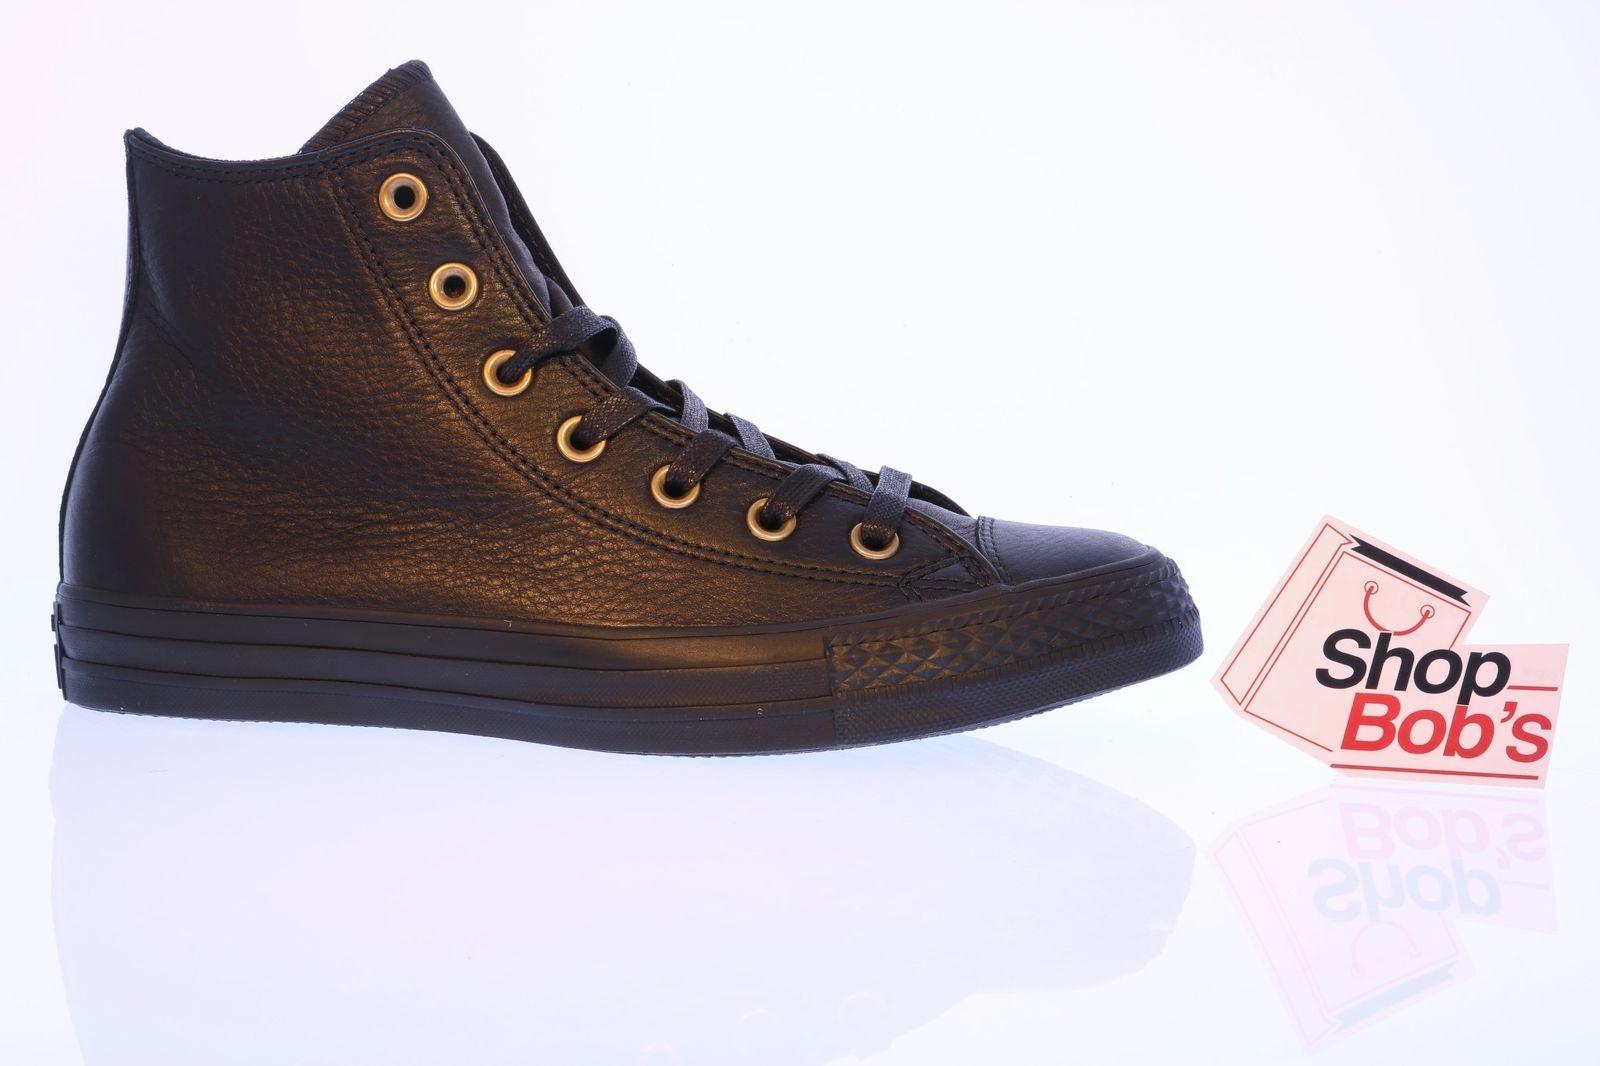 ... wholesale s l1600. s l1600. nib converse custom chuck taylor all star  black leather ... 719adc40a